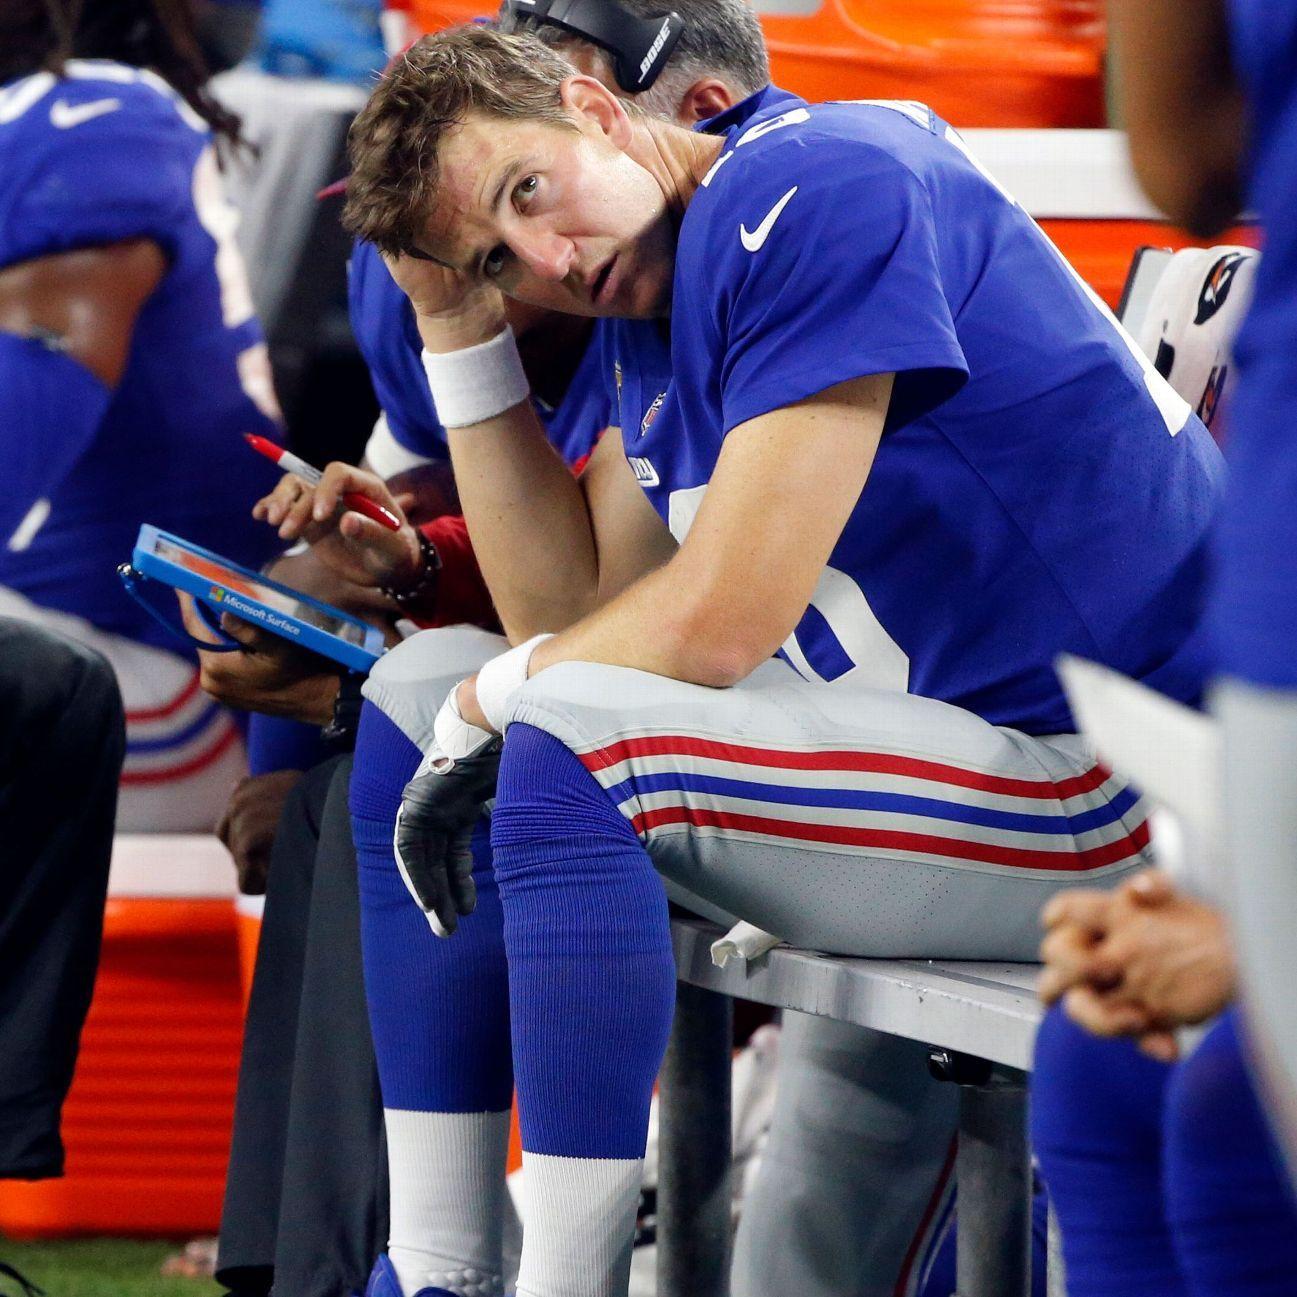 New York Giants To Start Quarterback Geno Smith Over Eli Manning This Week